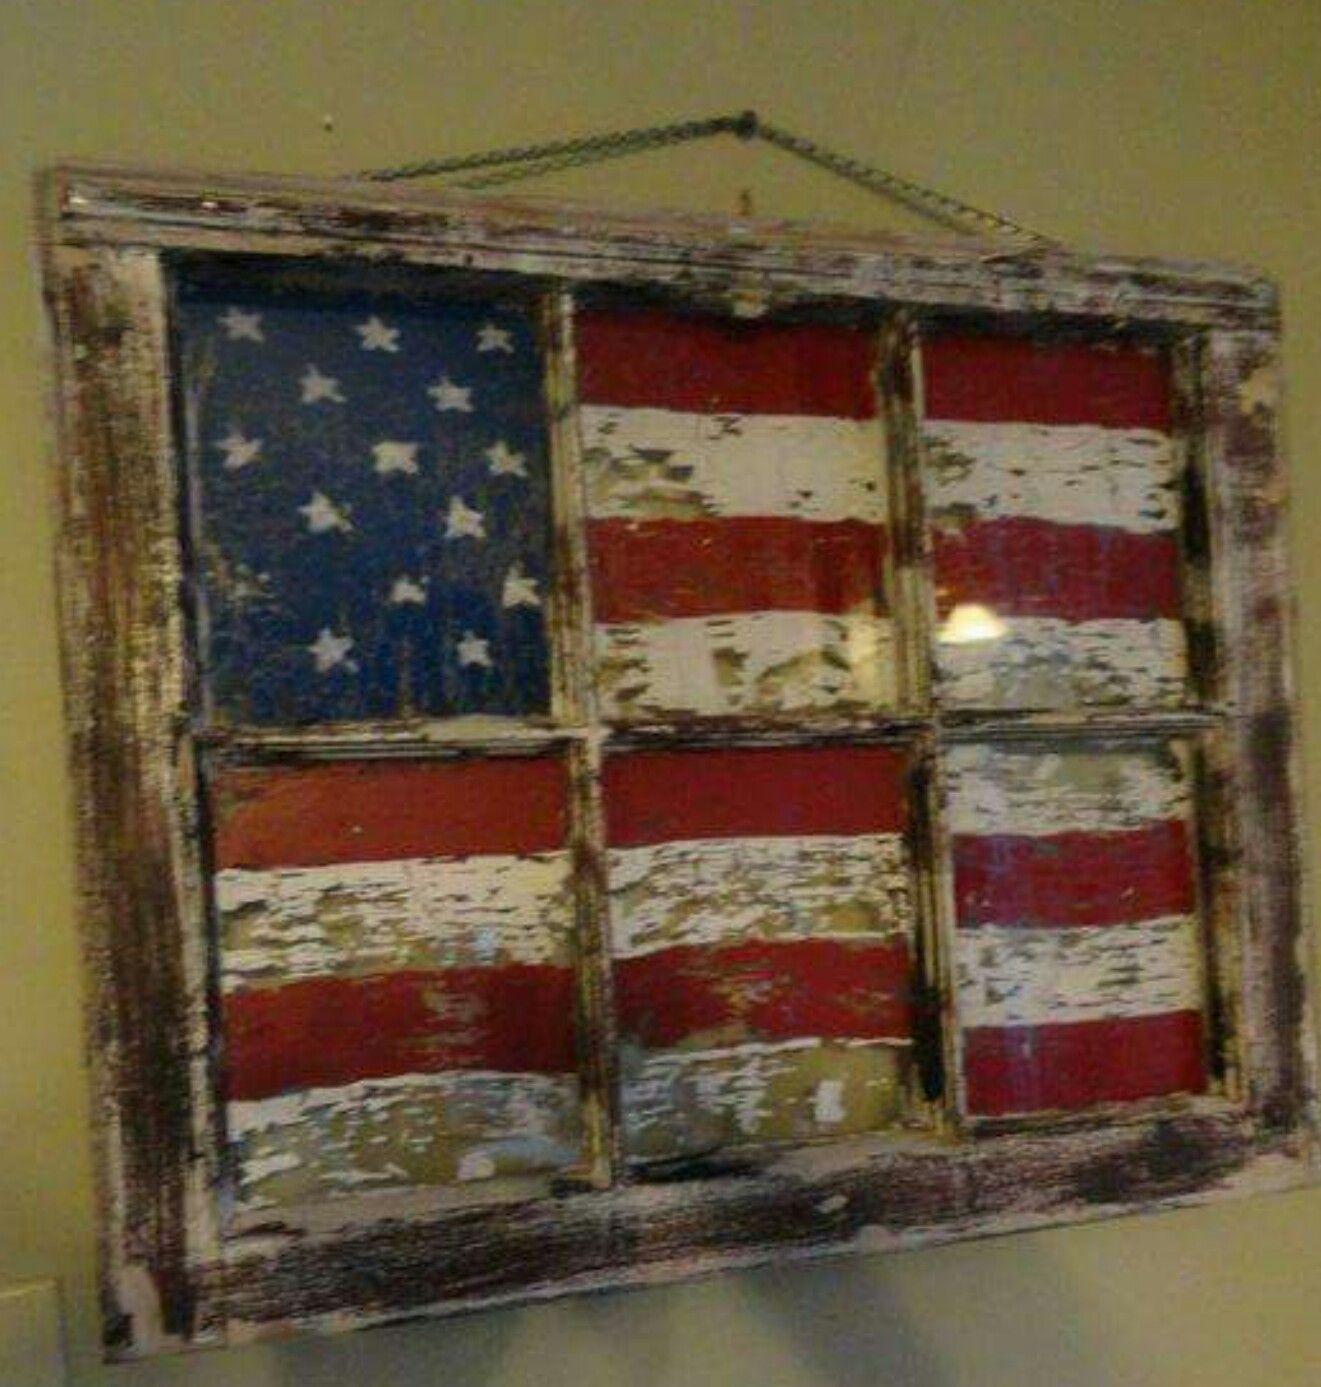 Barn window decor  great idea for ols window  barn wood ideas  pinterest  crafts